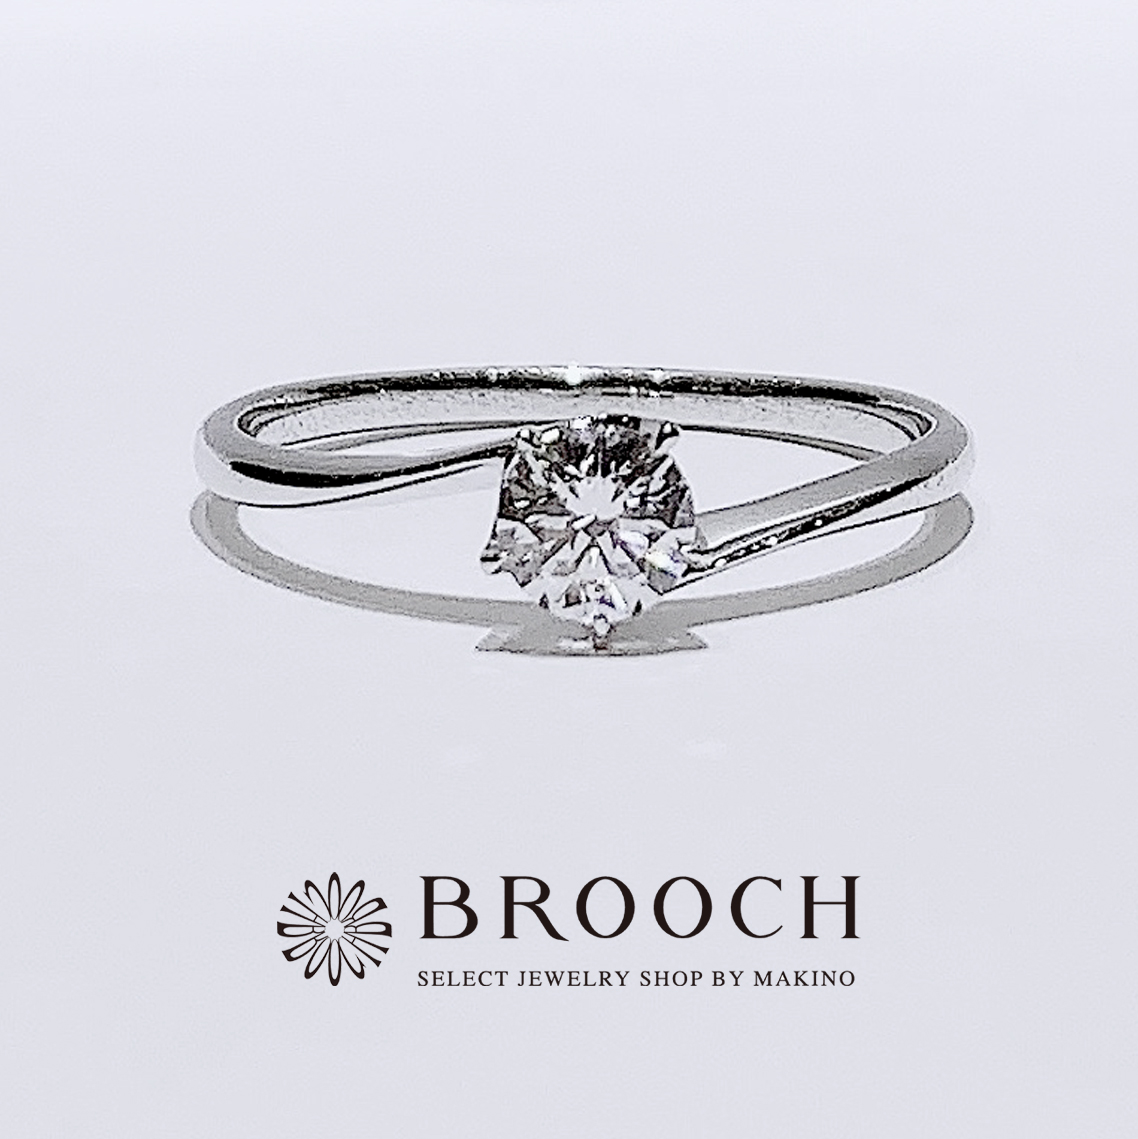 BROOCH 婚約指輪 エンゲージリング 5点留めダイヤウェーブデザイン